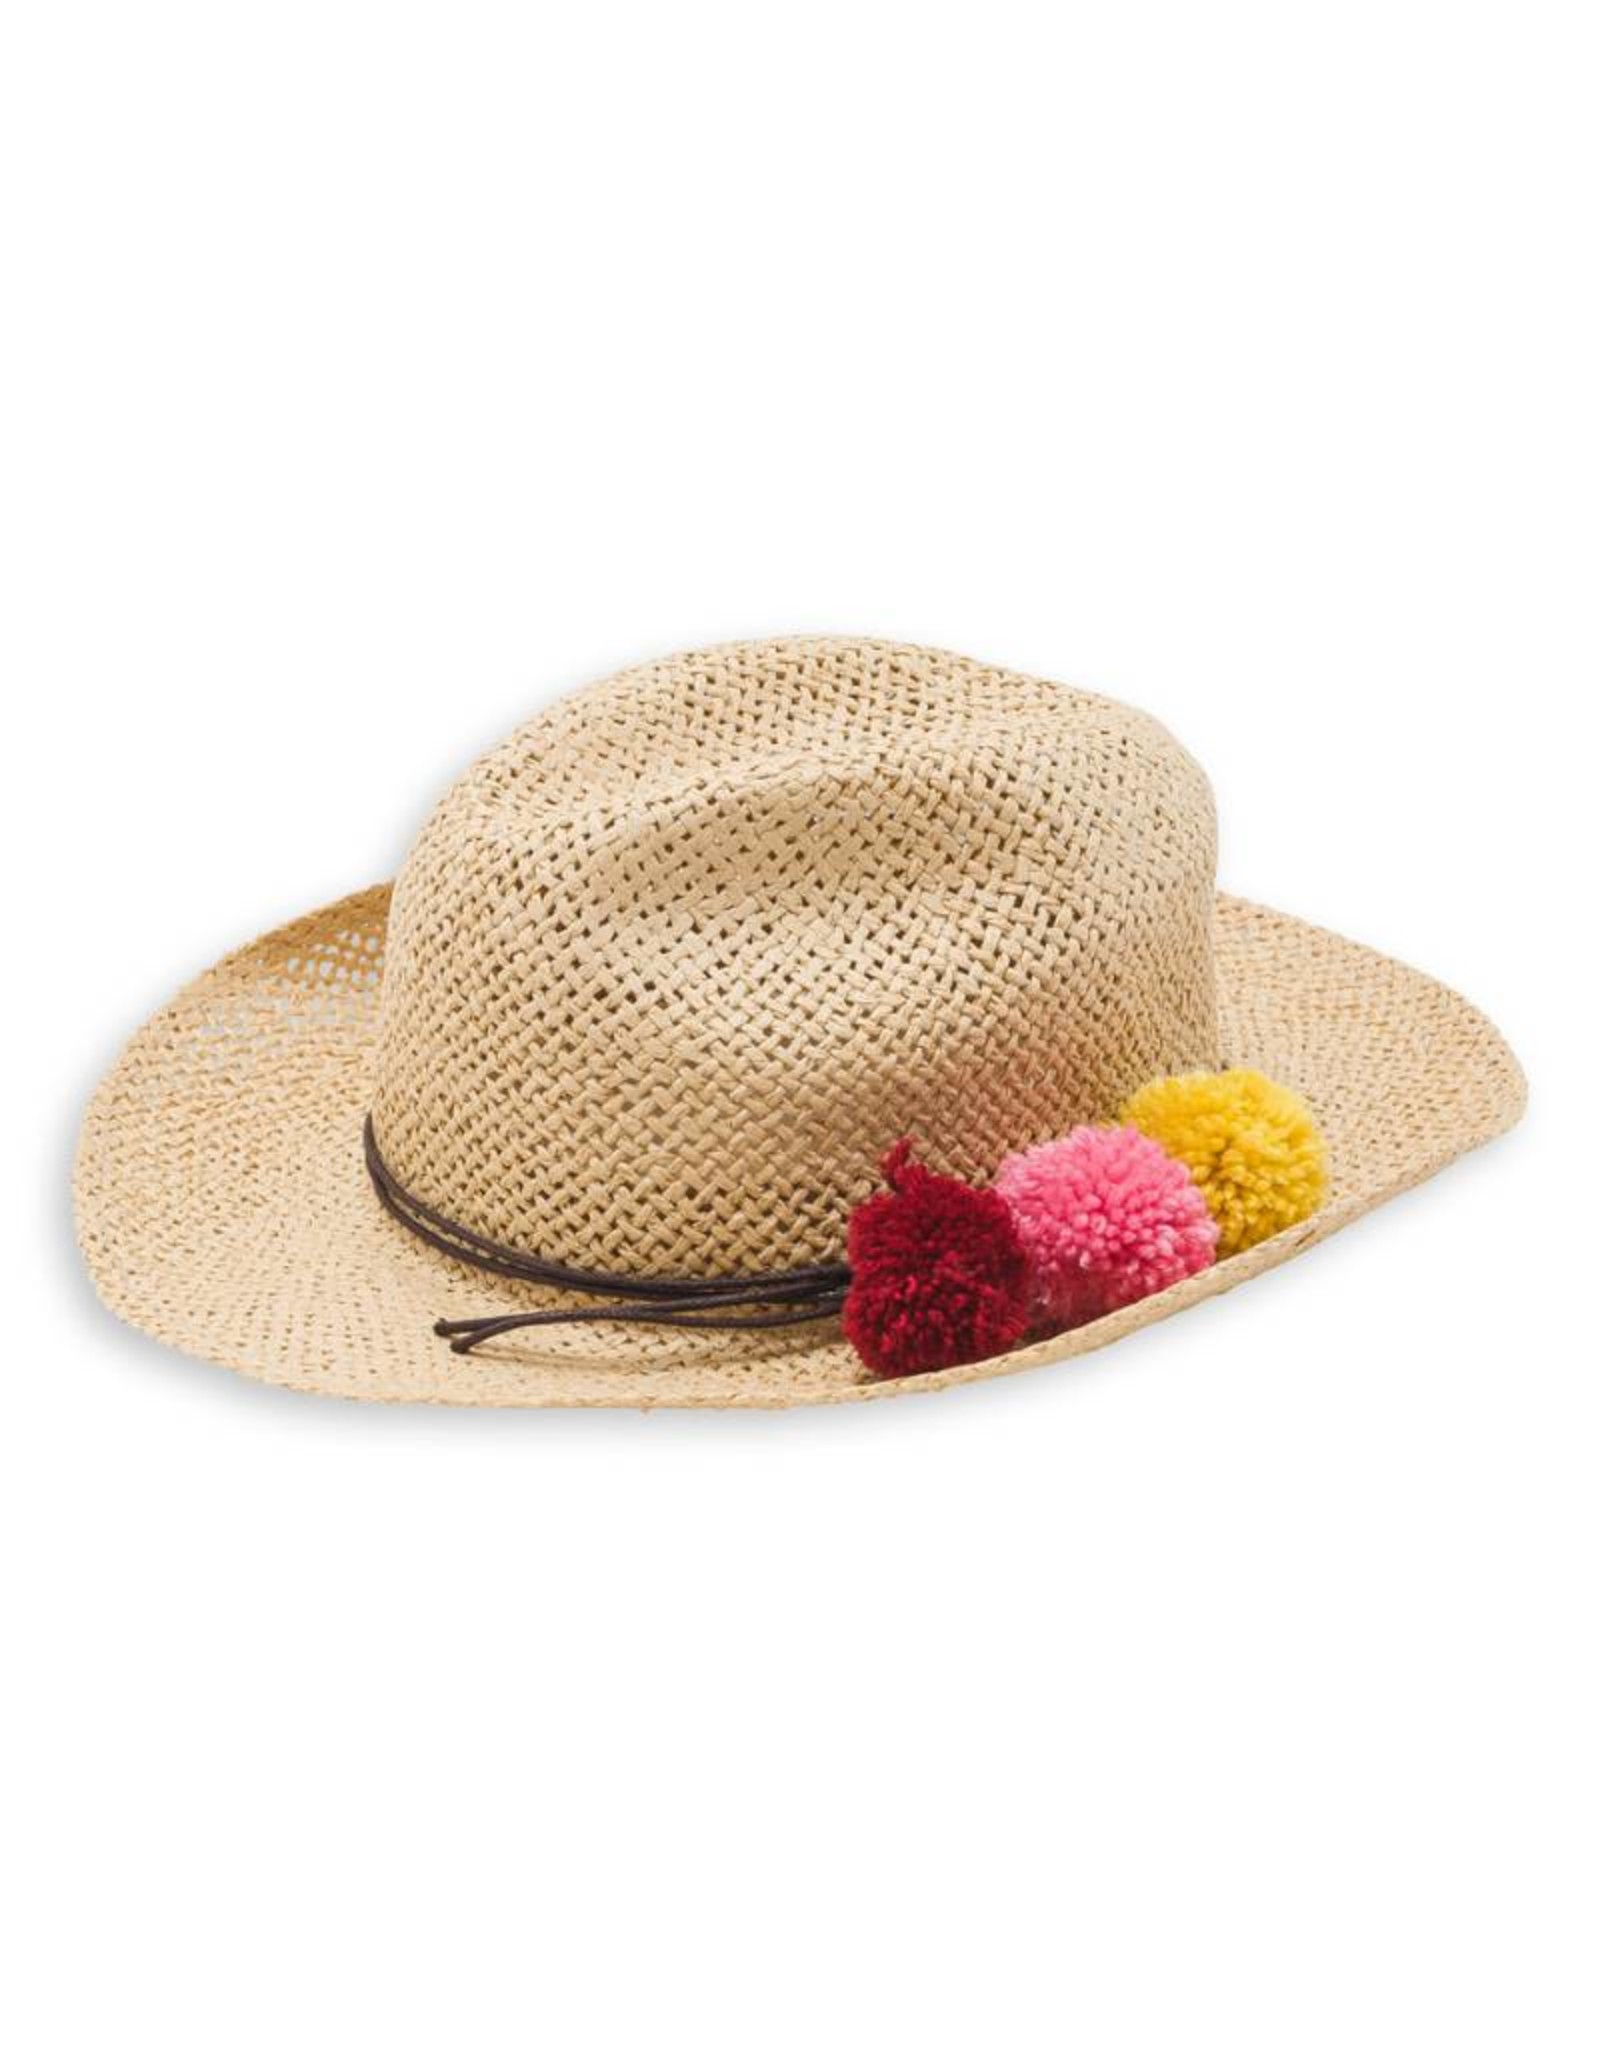 Pompon hat